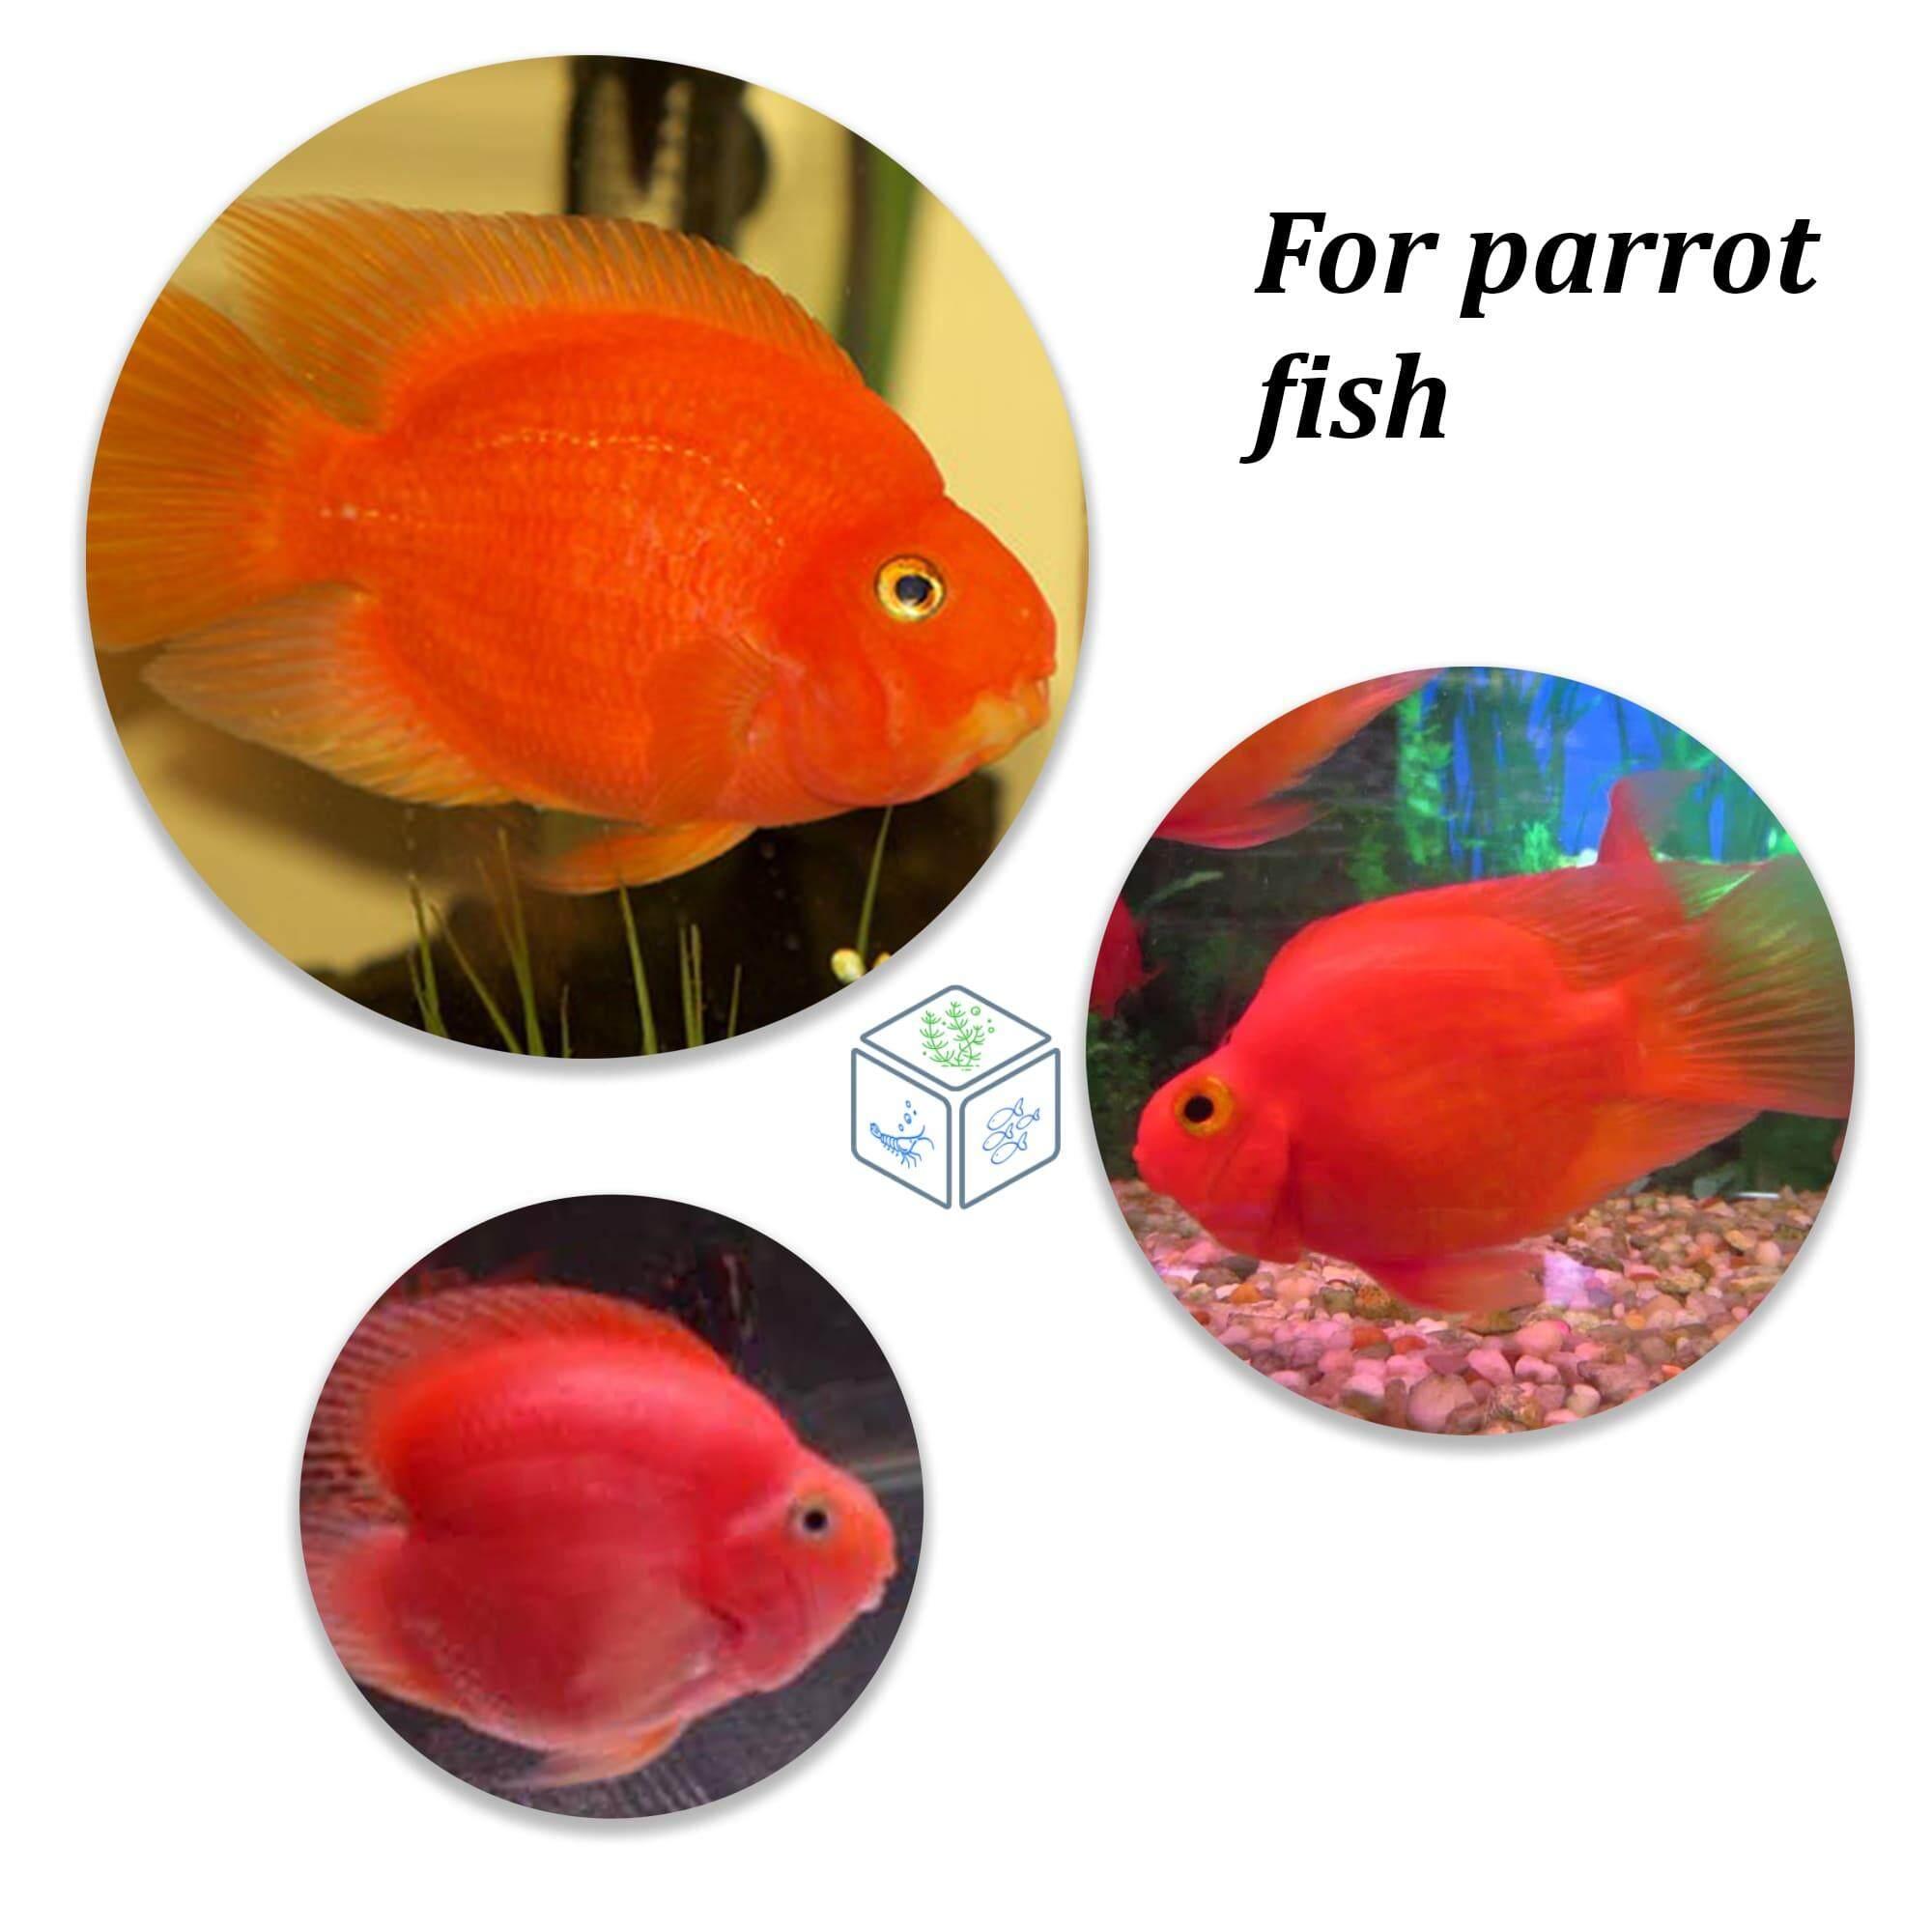 Hikari Blood Red Parrot 333g (Mini) Parrot Fish Food